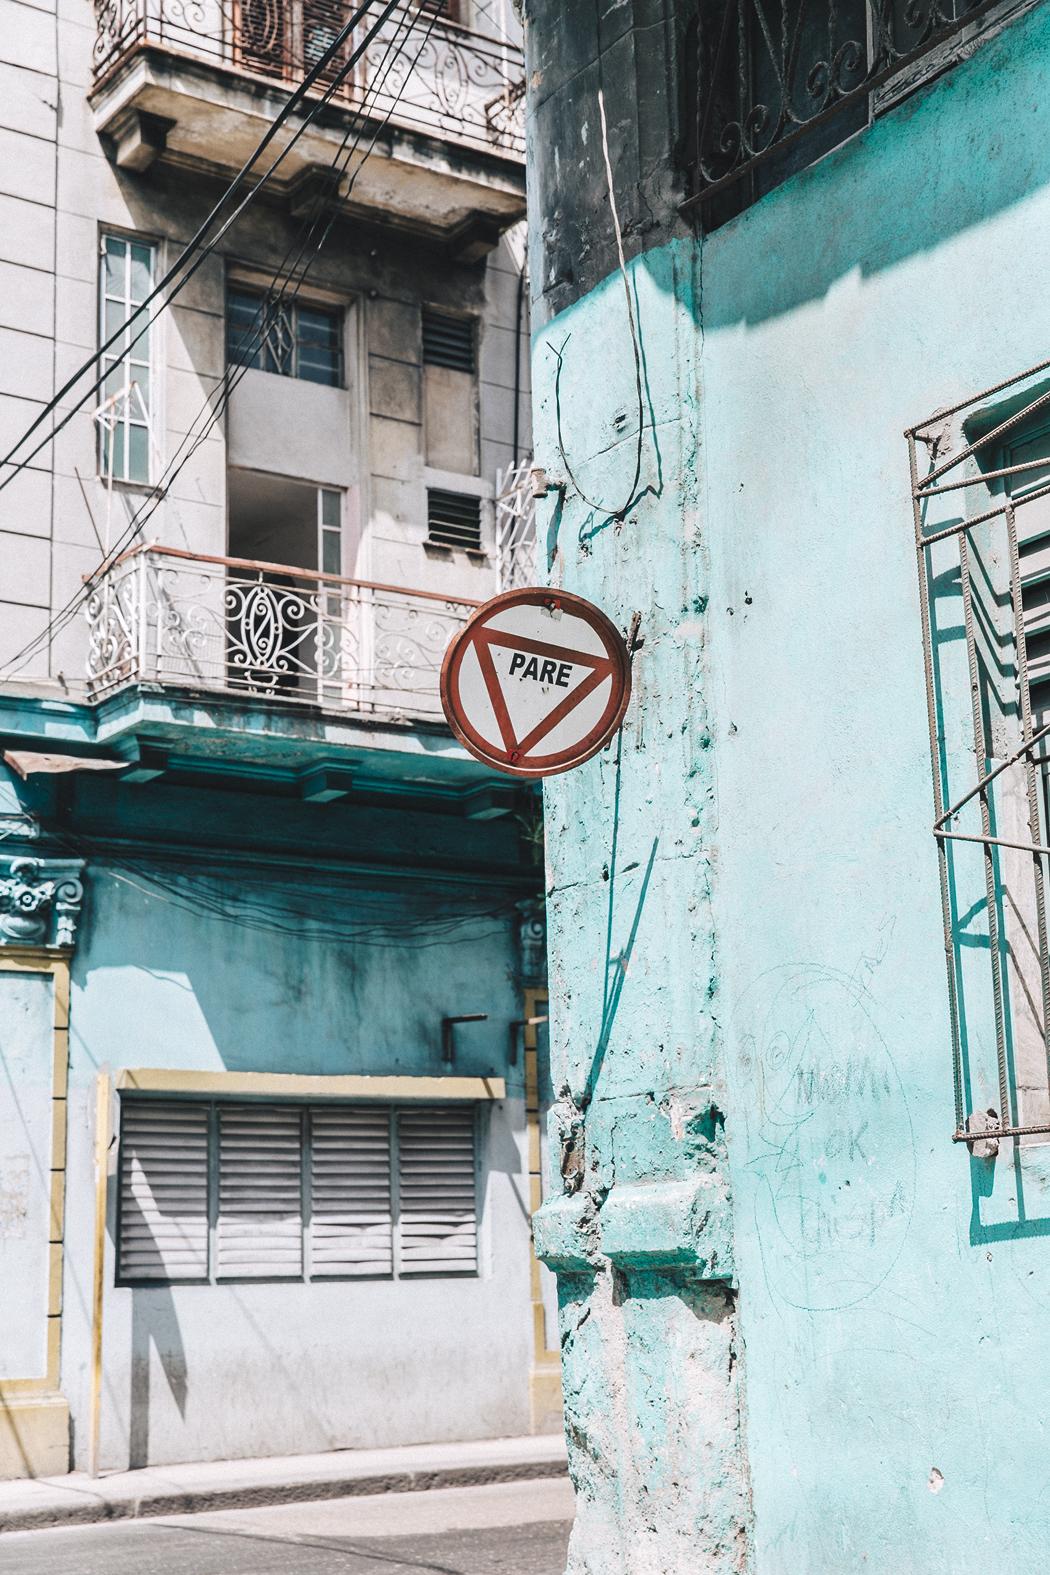 La_Habana-Cuba-Collage_On_The_Road-Fresa_Y_Chocolate-La_Guarida-Mint_Dress-Revolve_Clothing-Espadrilles-Outfit-Collage_Vintage-150